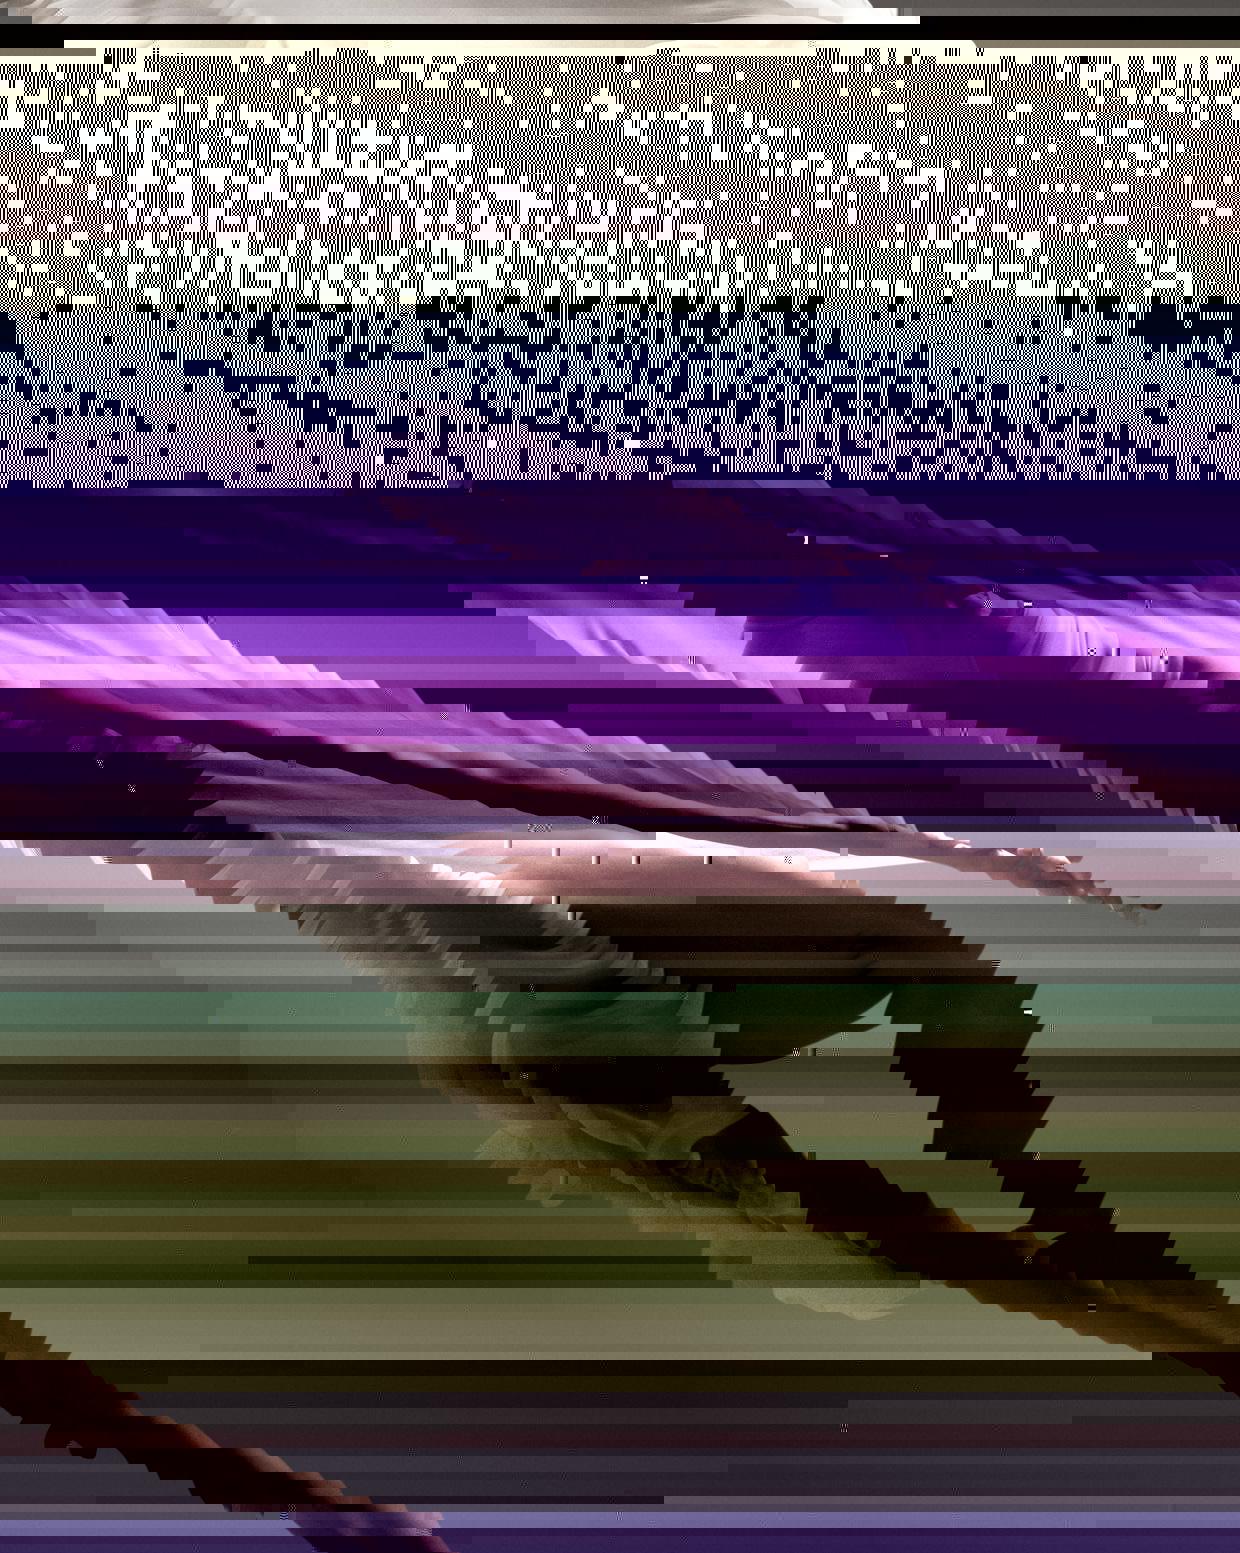 acc21aa03c5035d4cfe764c9e8e53be0